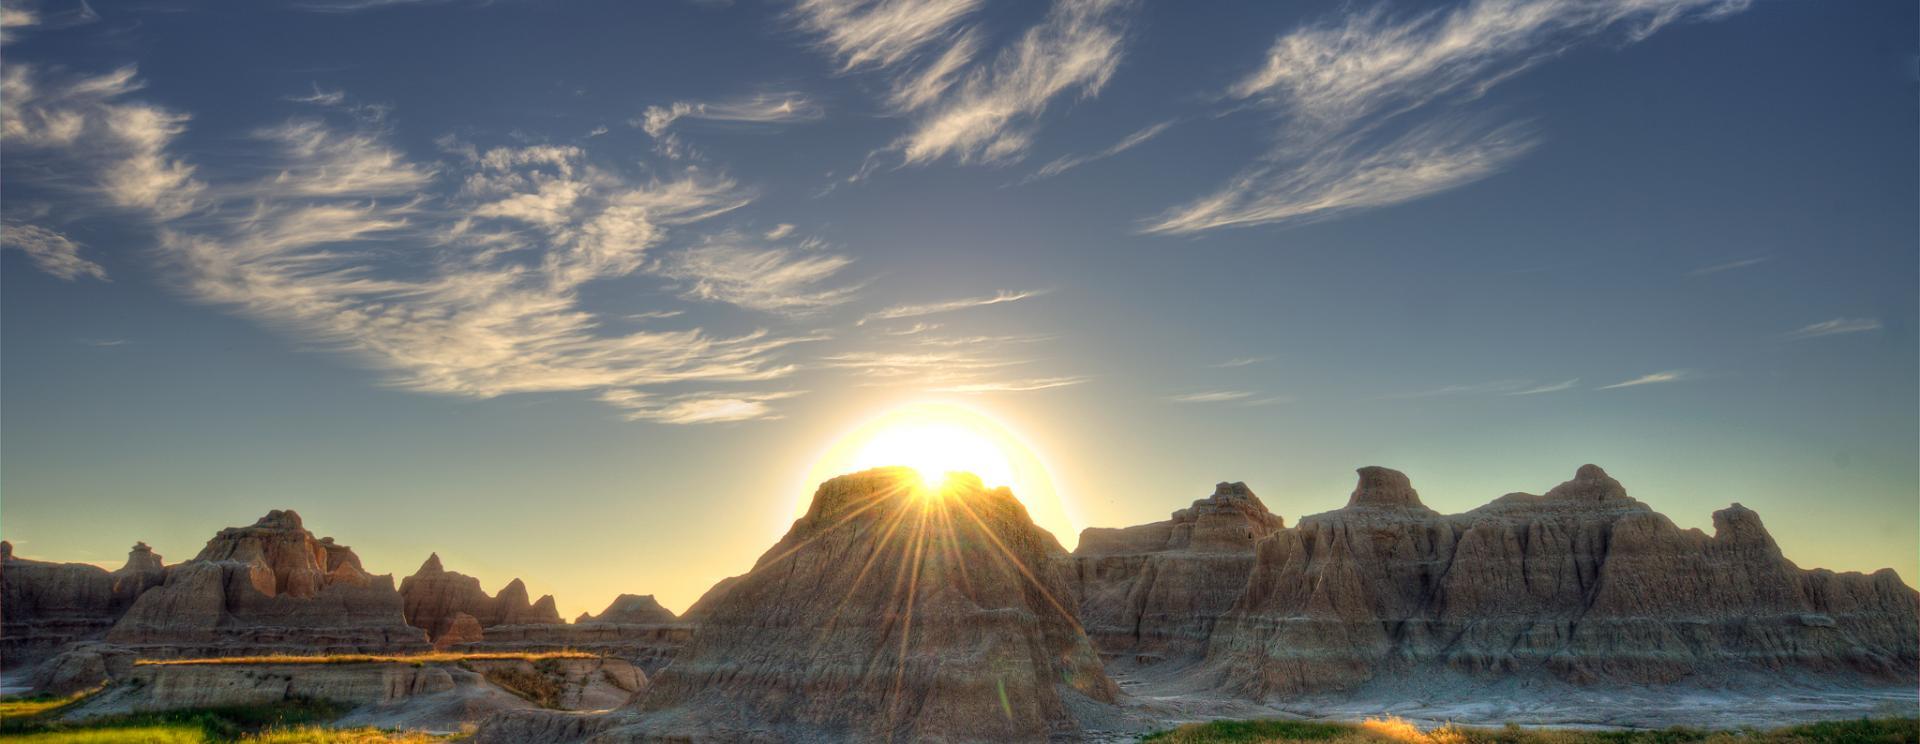 Black Hills Adventure Tours & Vacation Planning